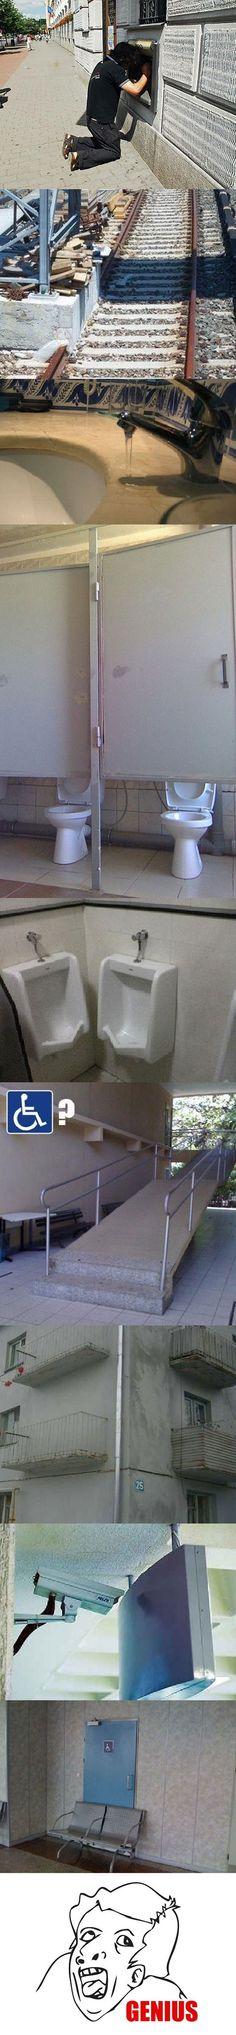 Human genius gone terribly wrong.